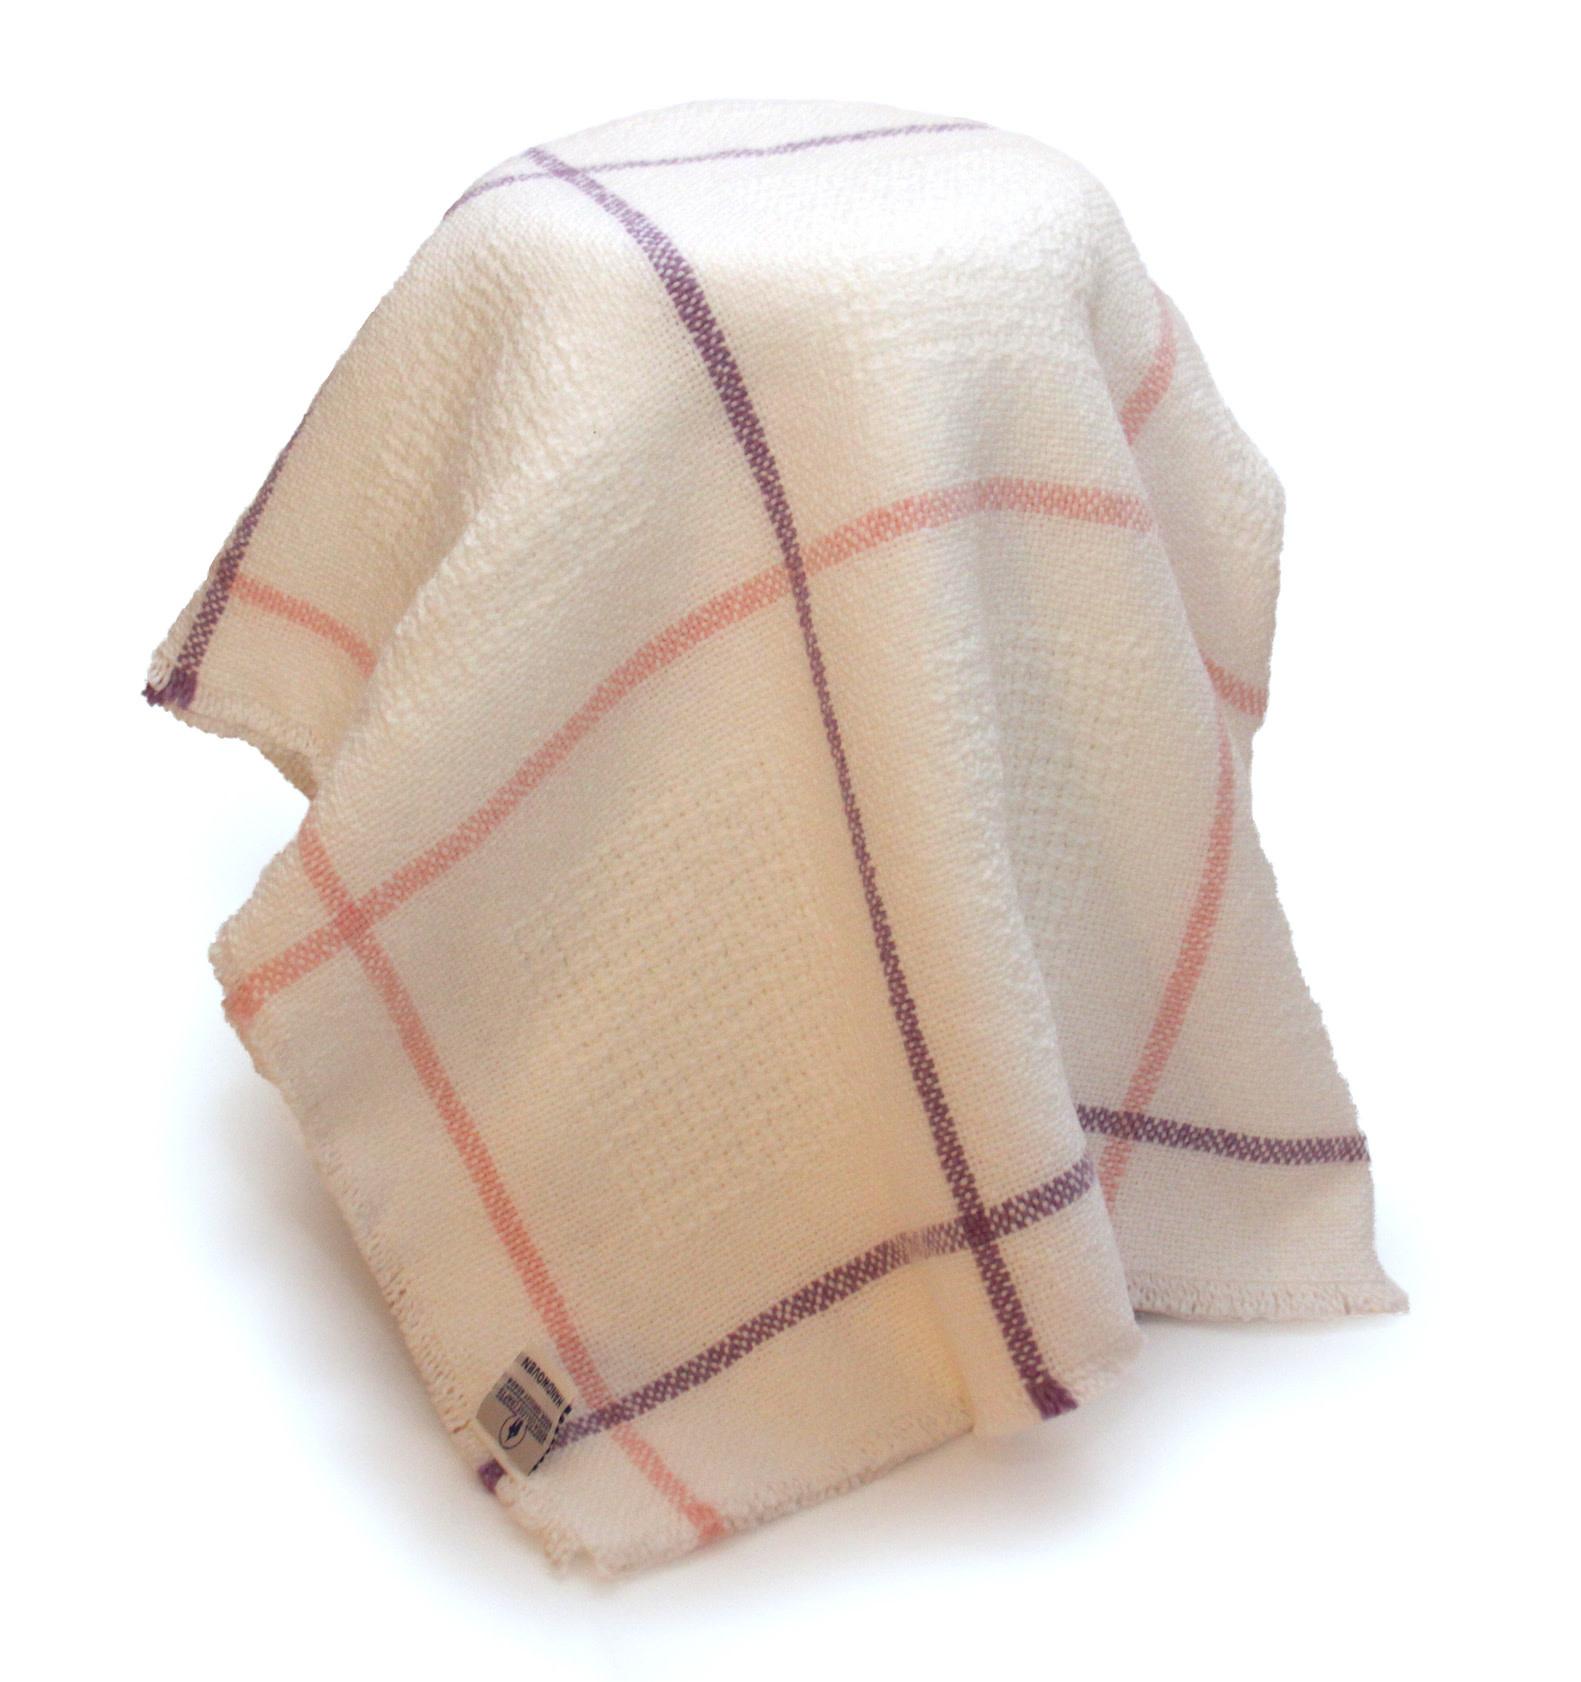 Grid Block Baby Blankets-4